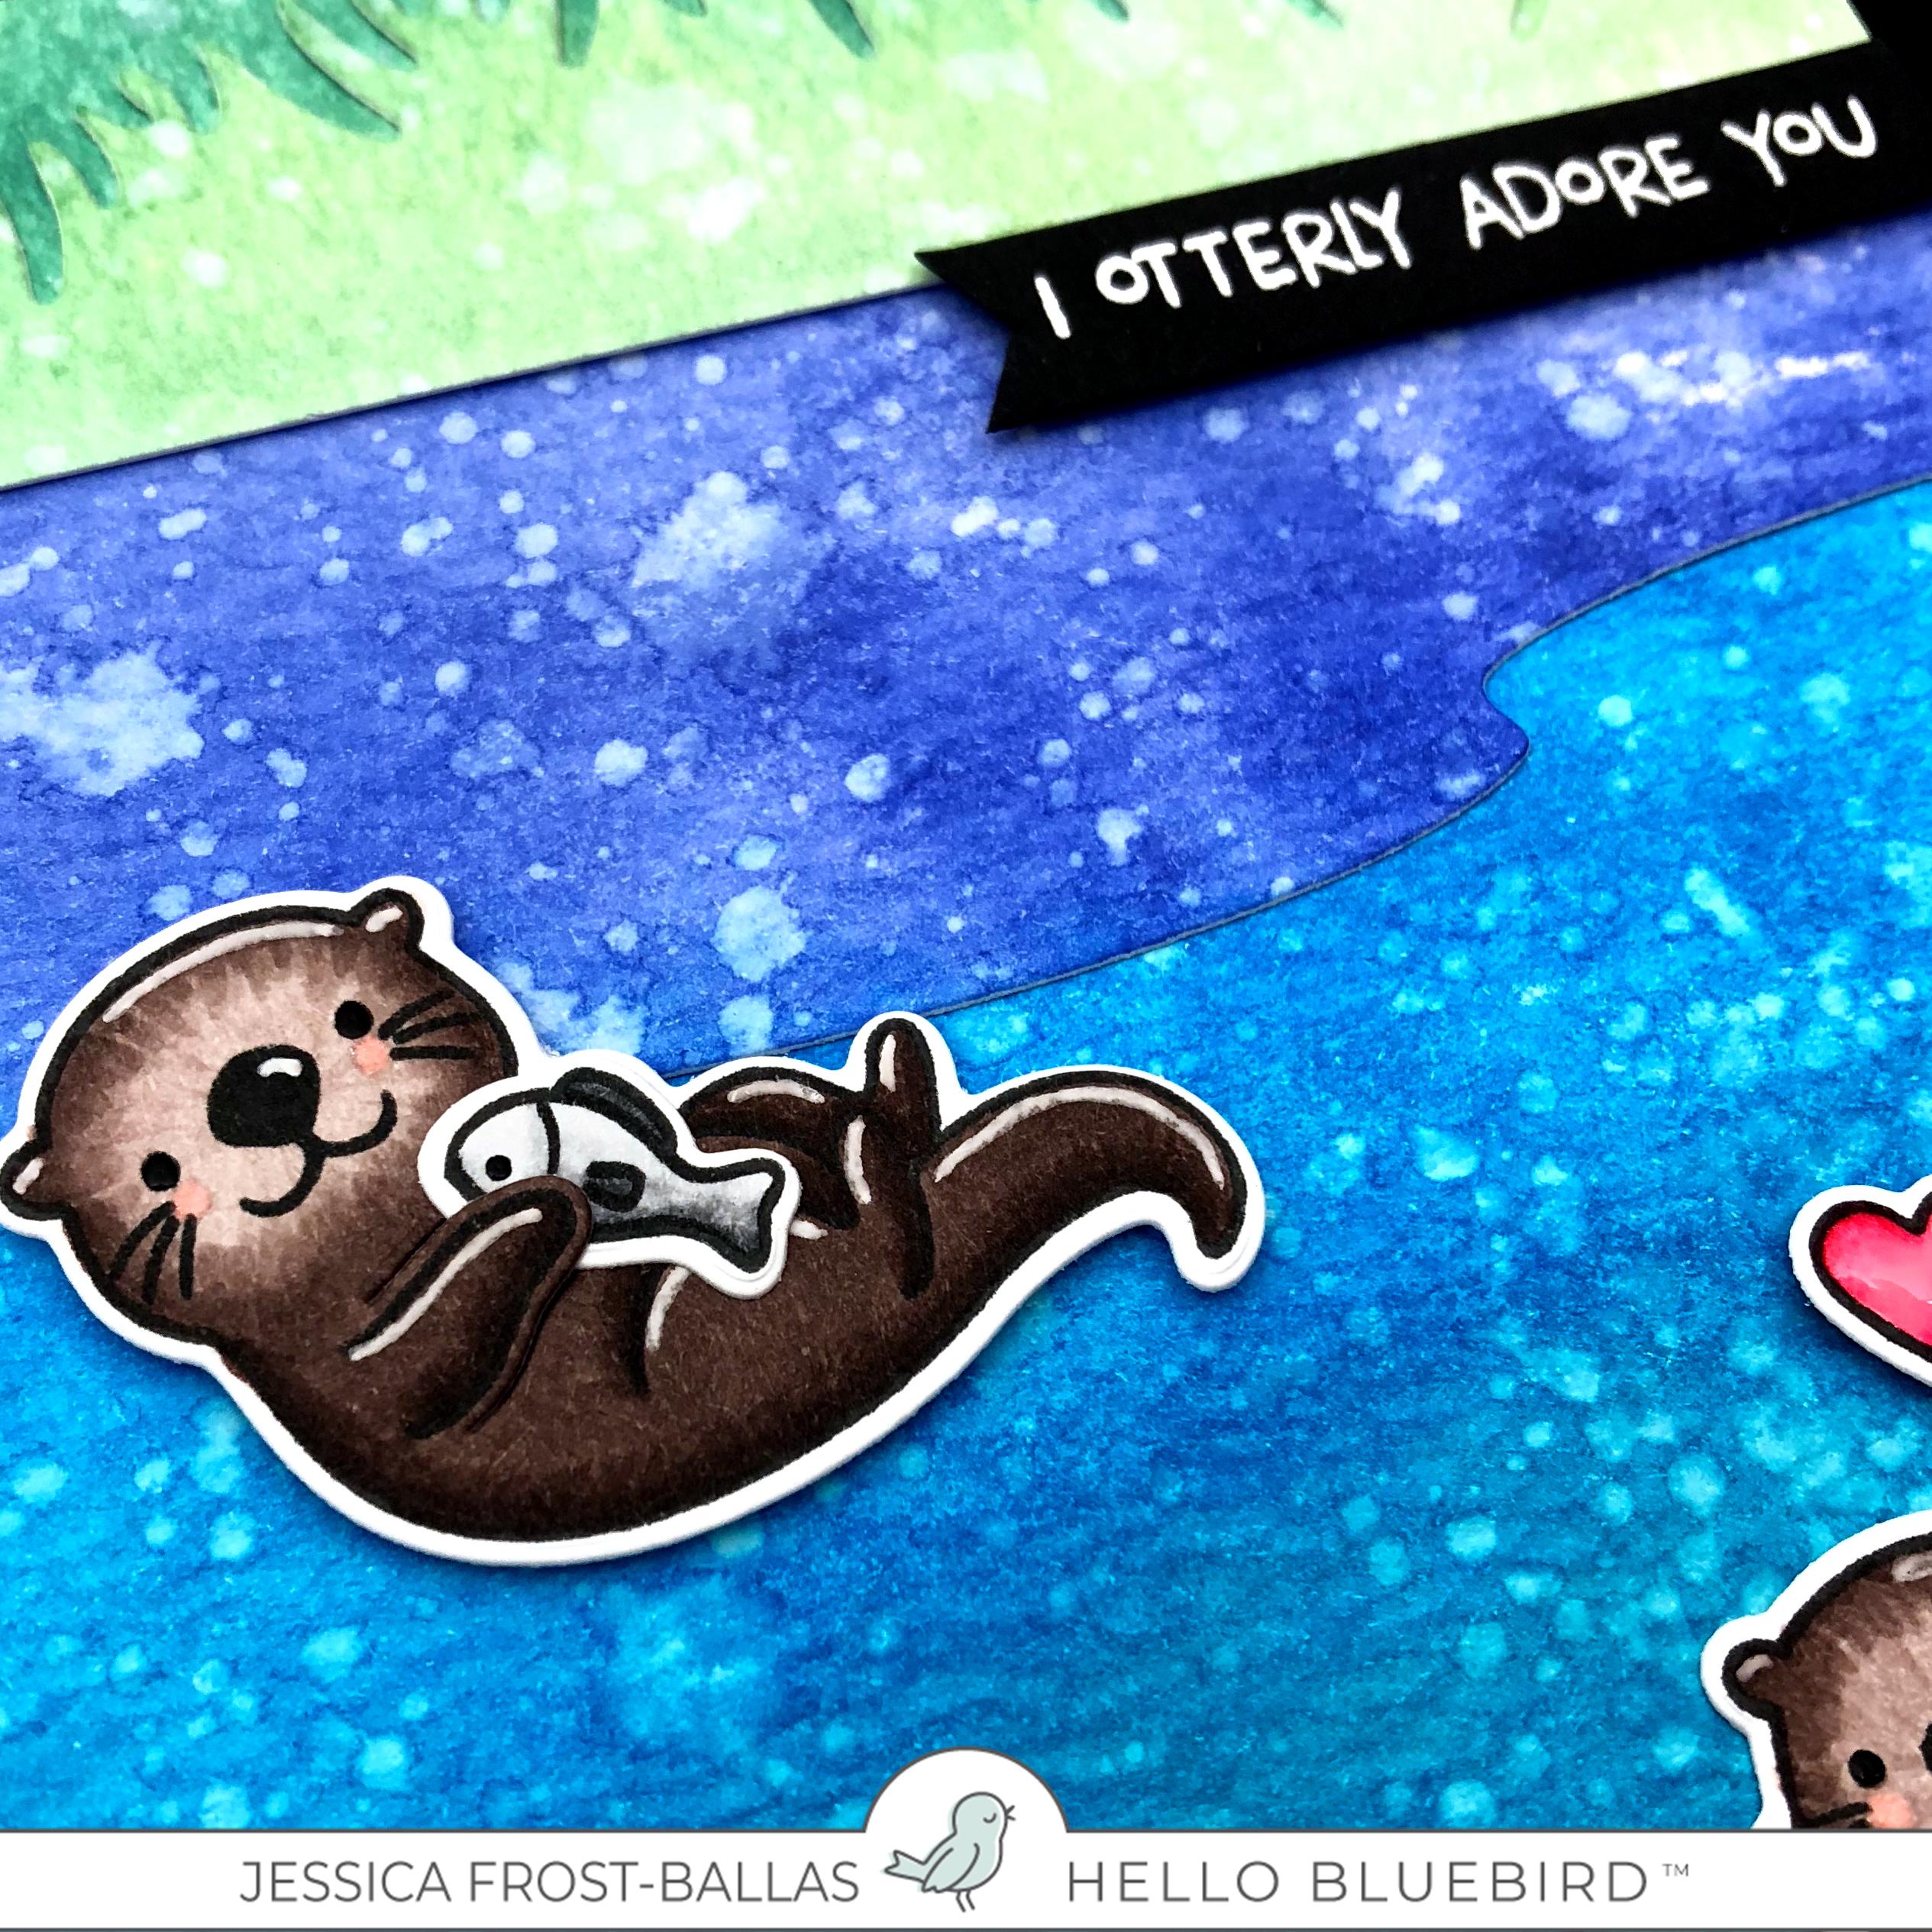 I Otterly Adore You by Jessica Frost-Ballas for Hello Bluebird